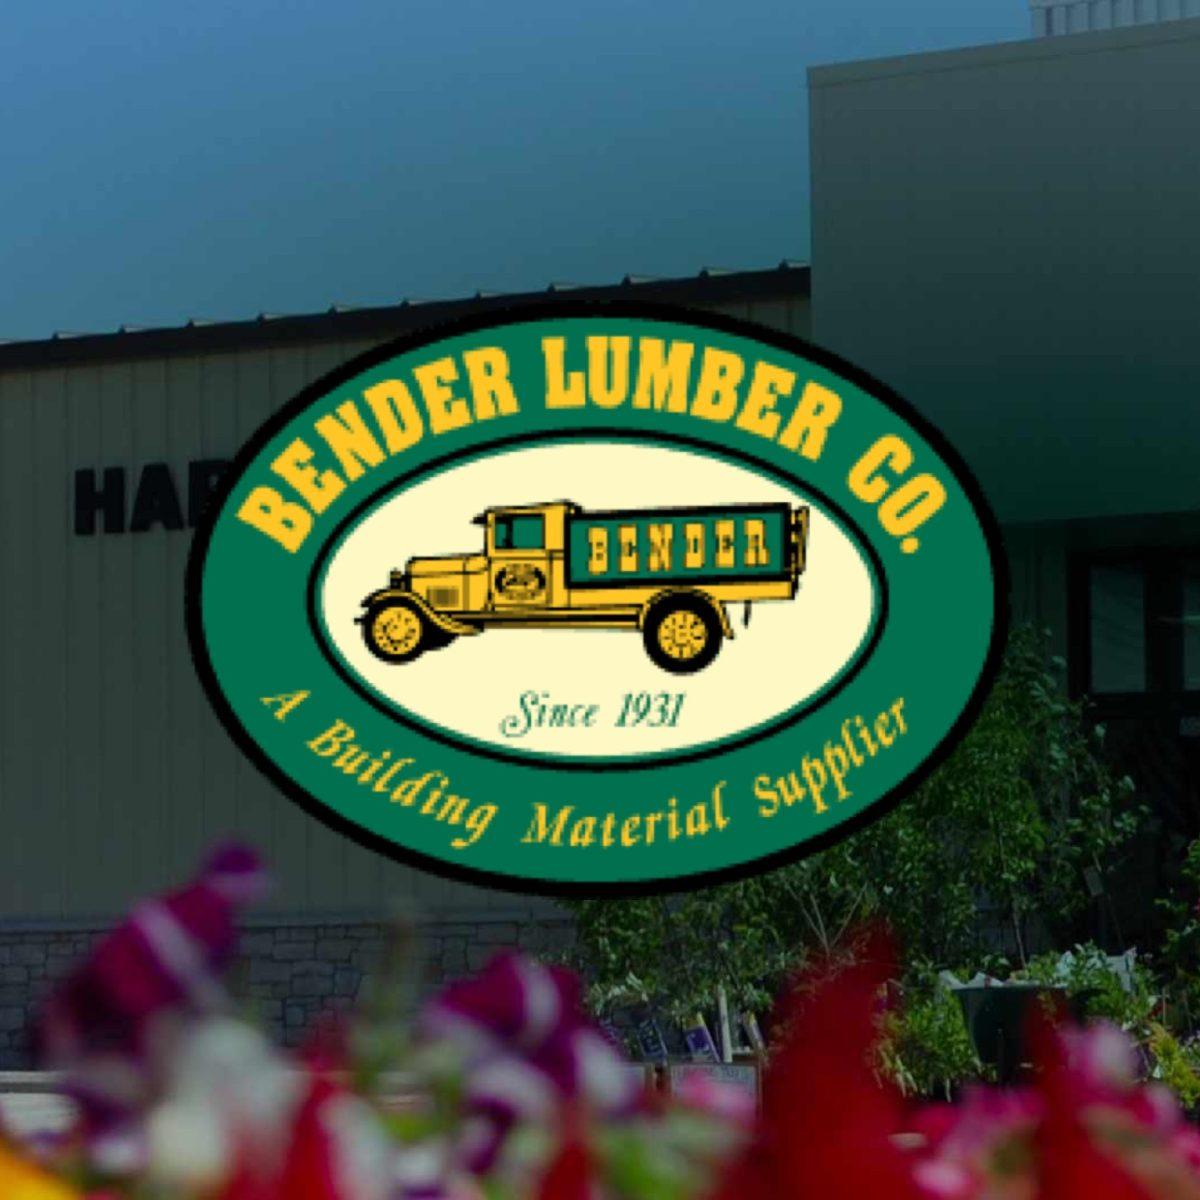 About Bender Lumber